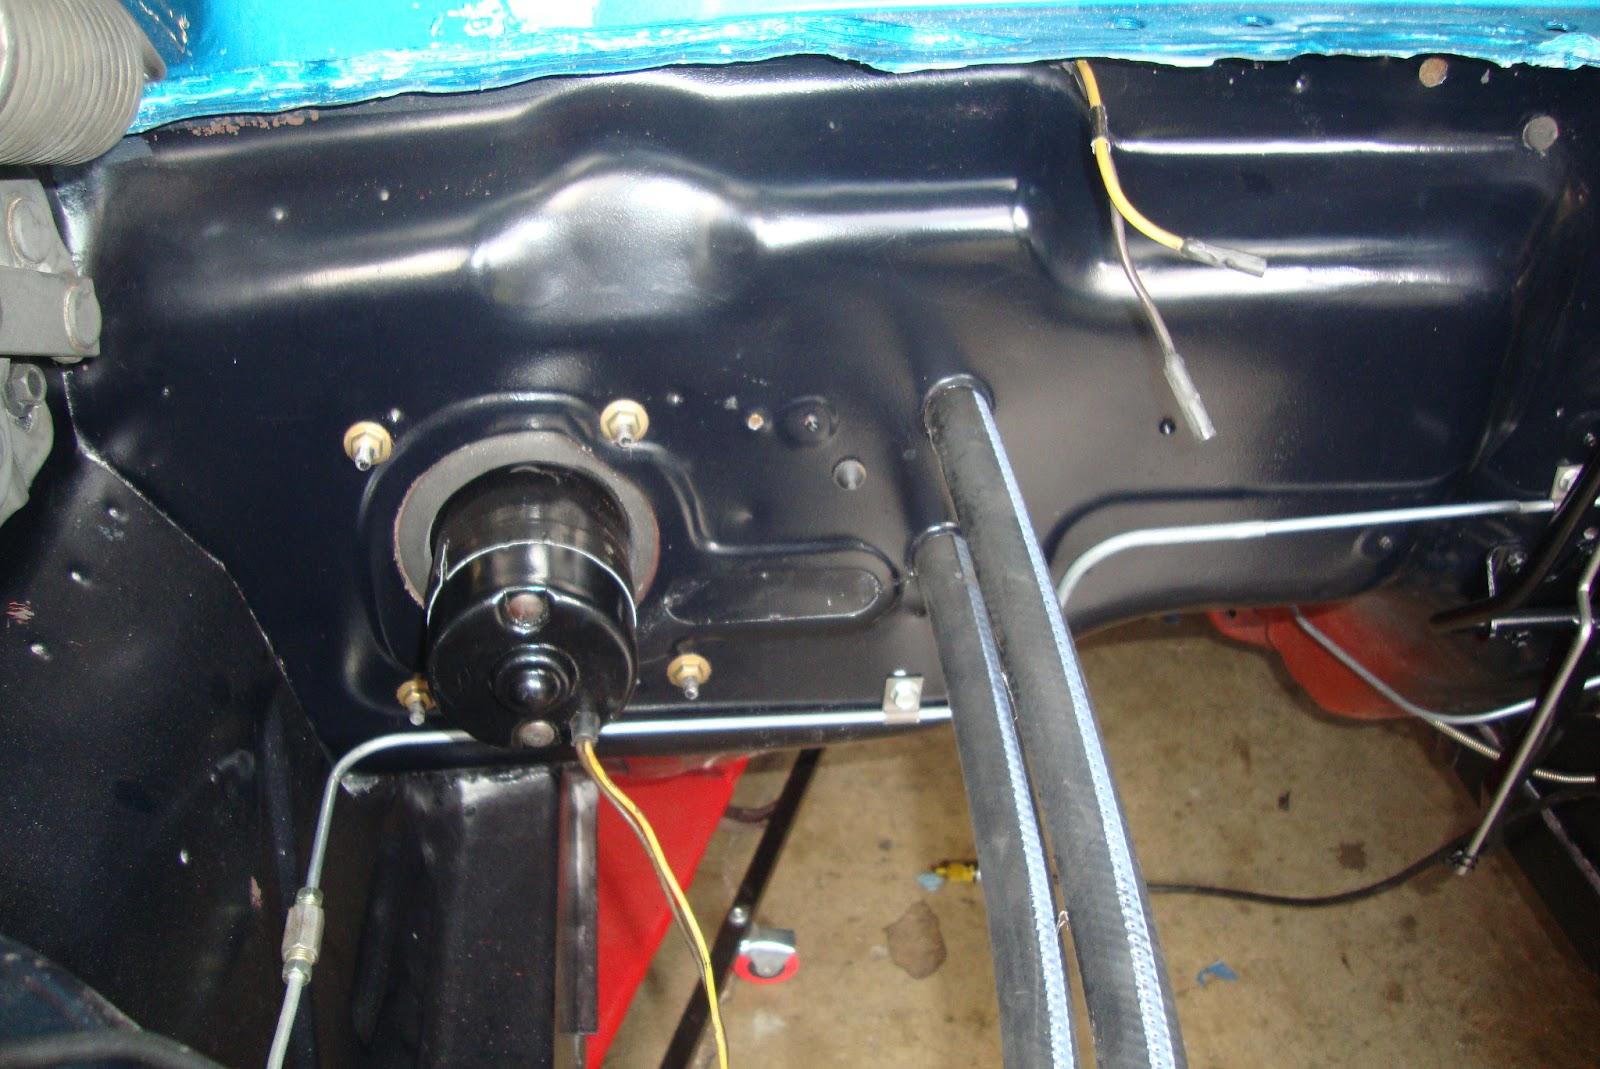 1965 Buick Riviera Vacuum Diagram Wire Data Schema Wiring For 1964 Part 2 Mustang Dash 1963 1971